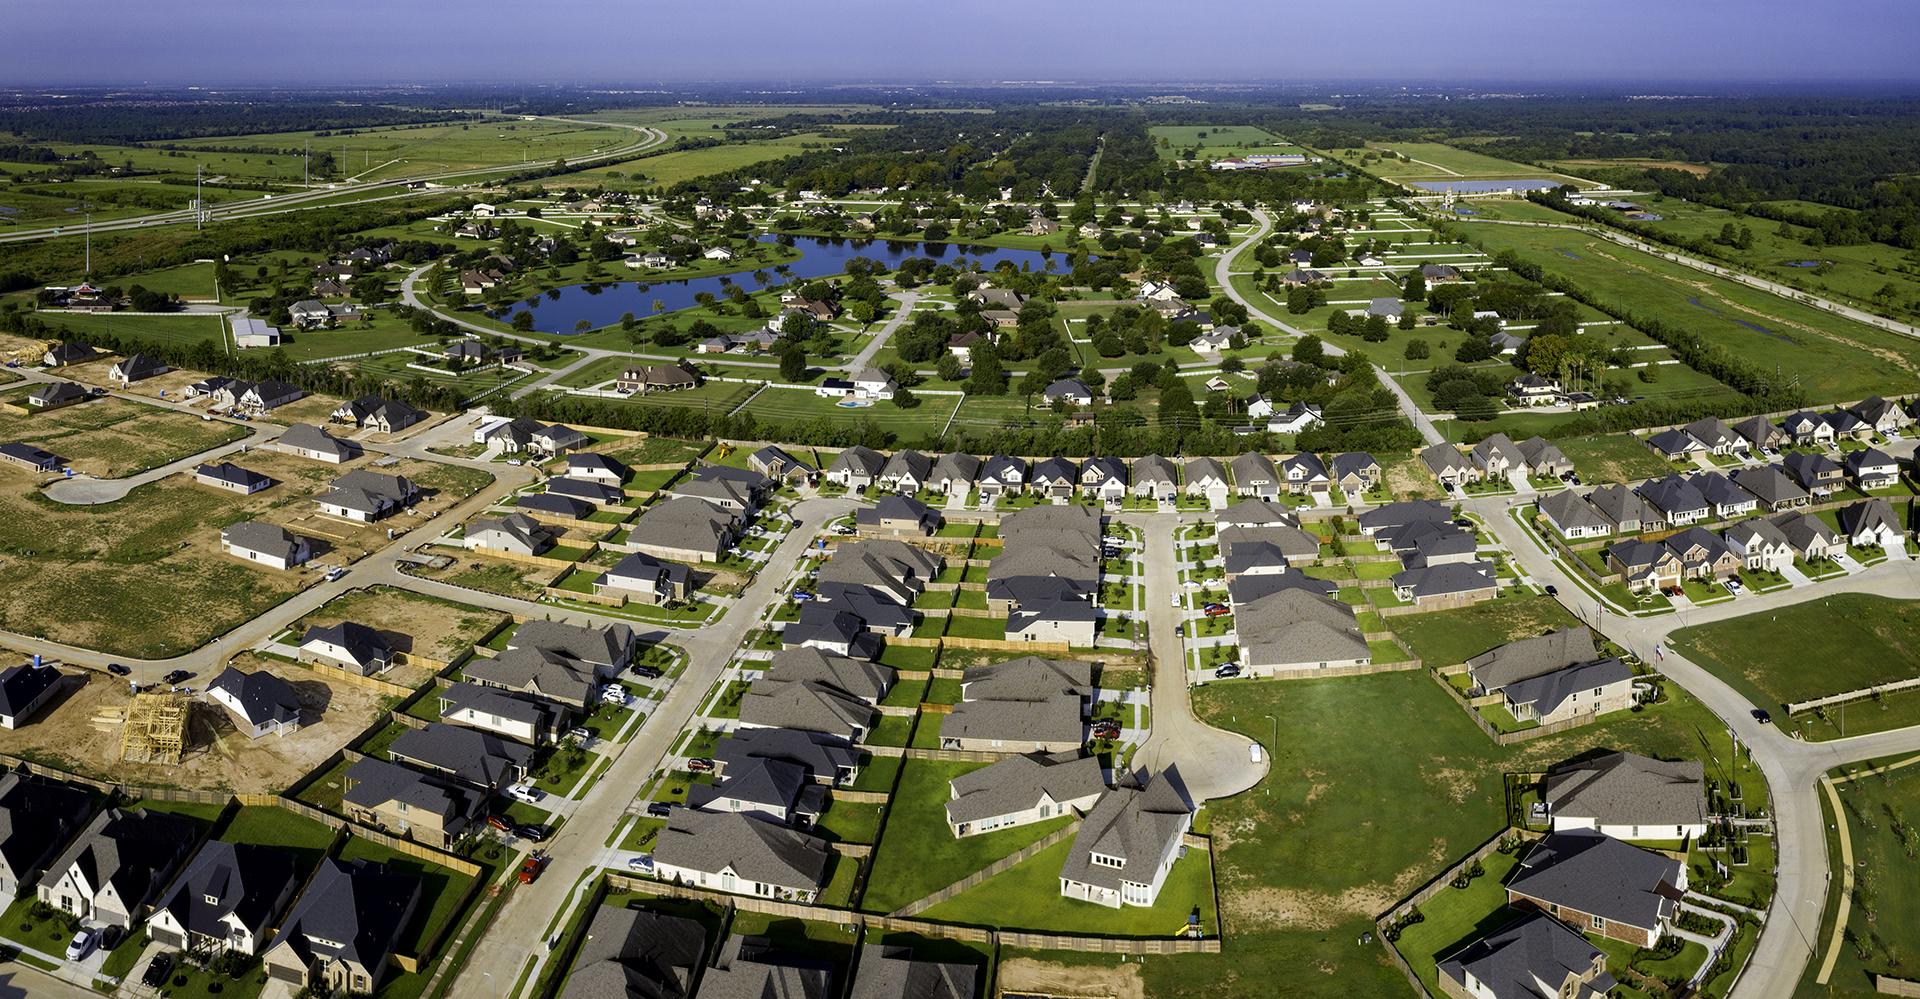 Amira-Harris County, Texas